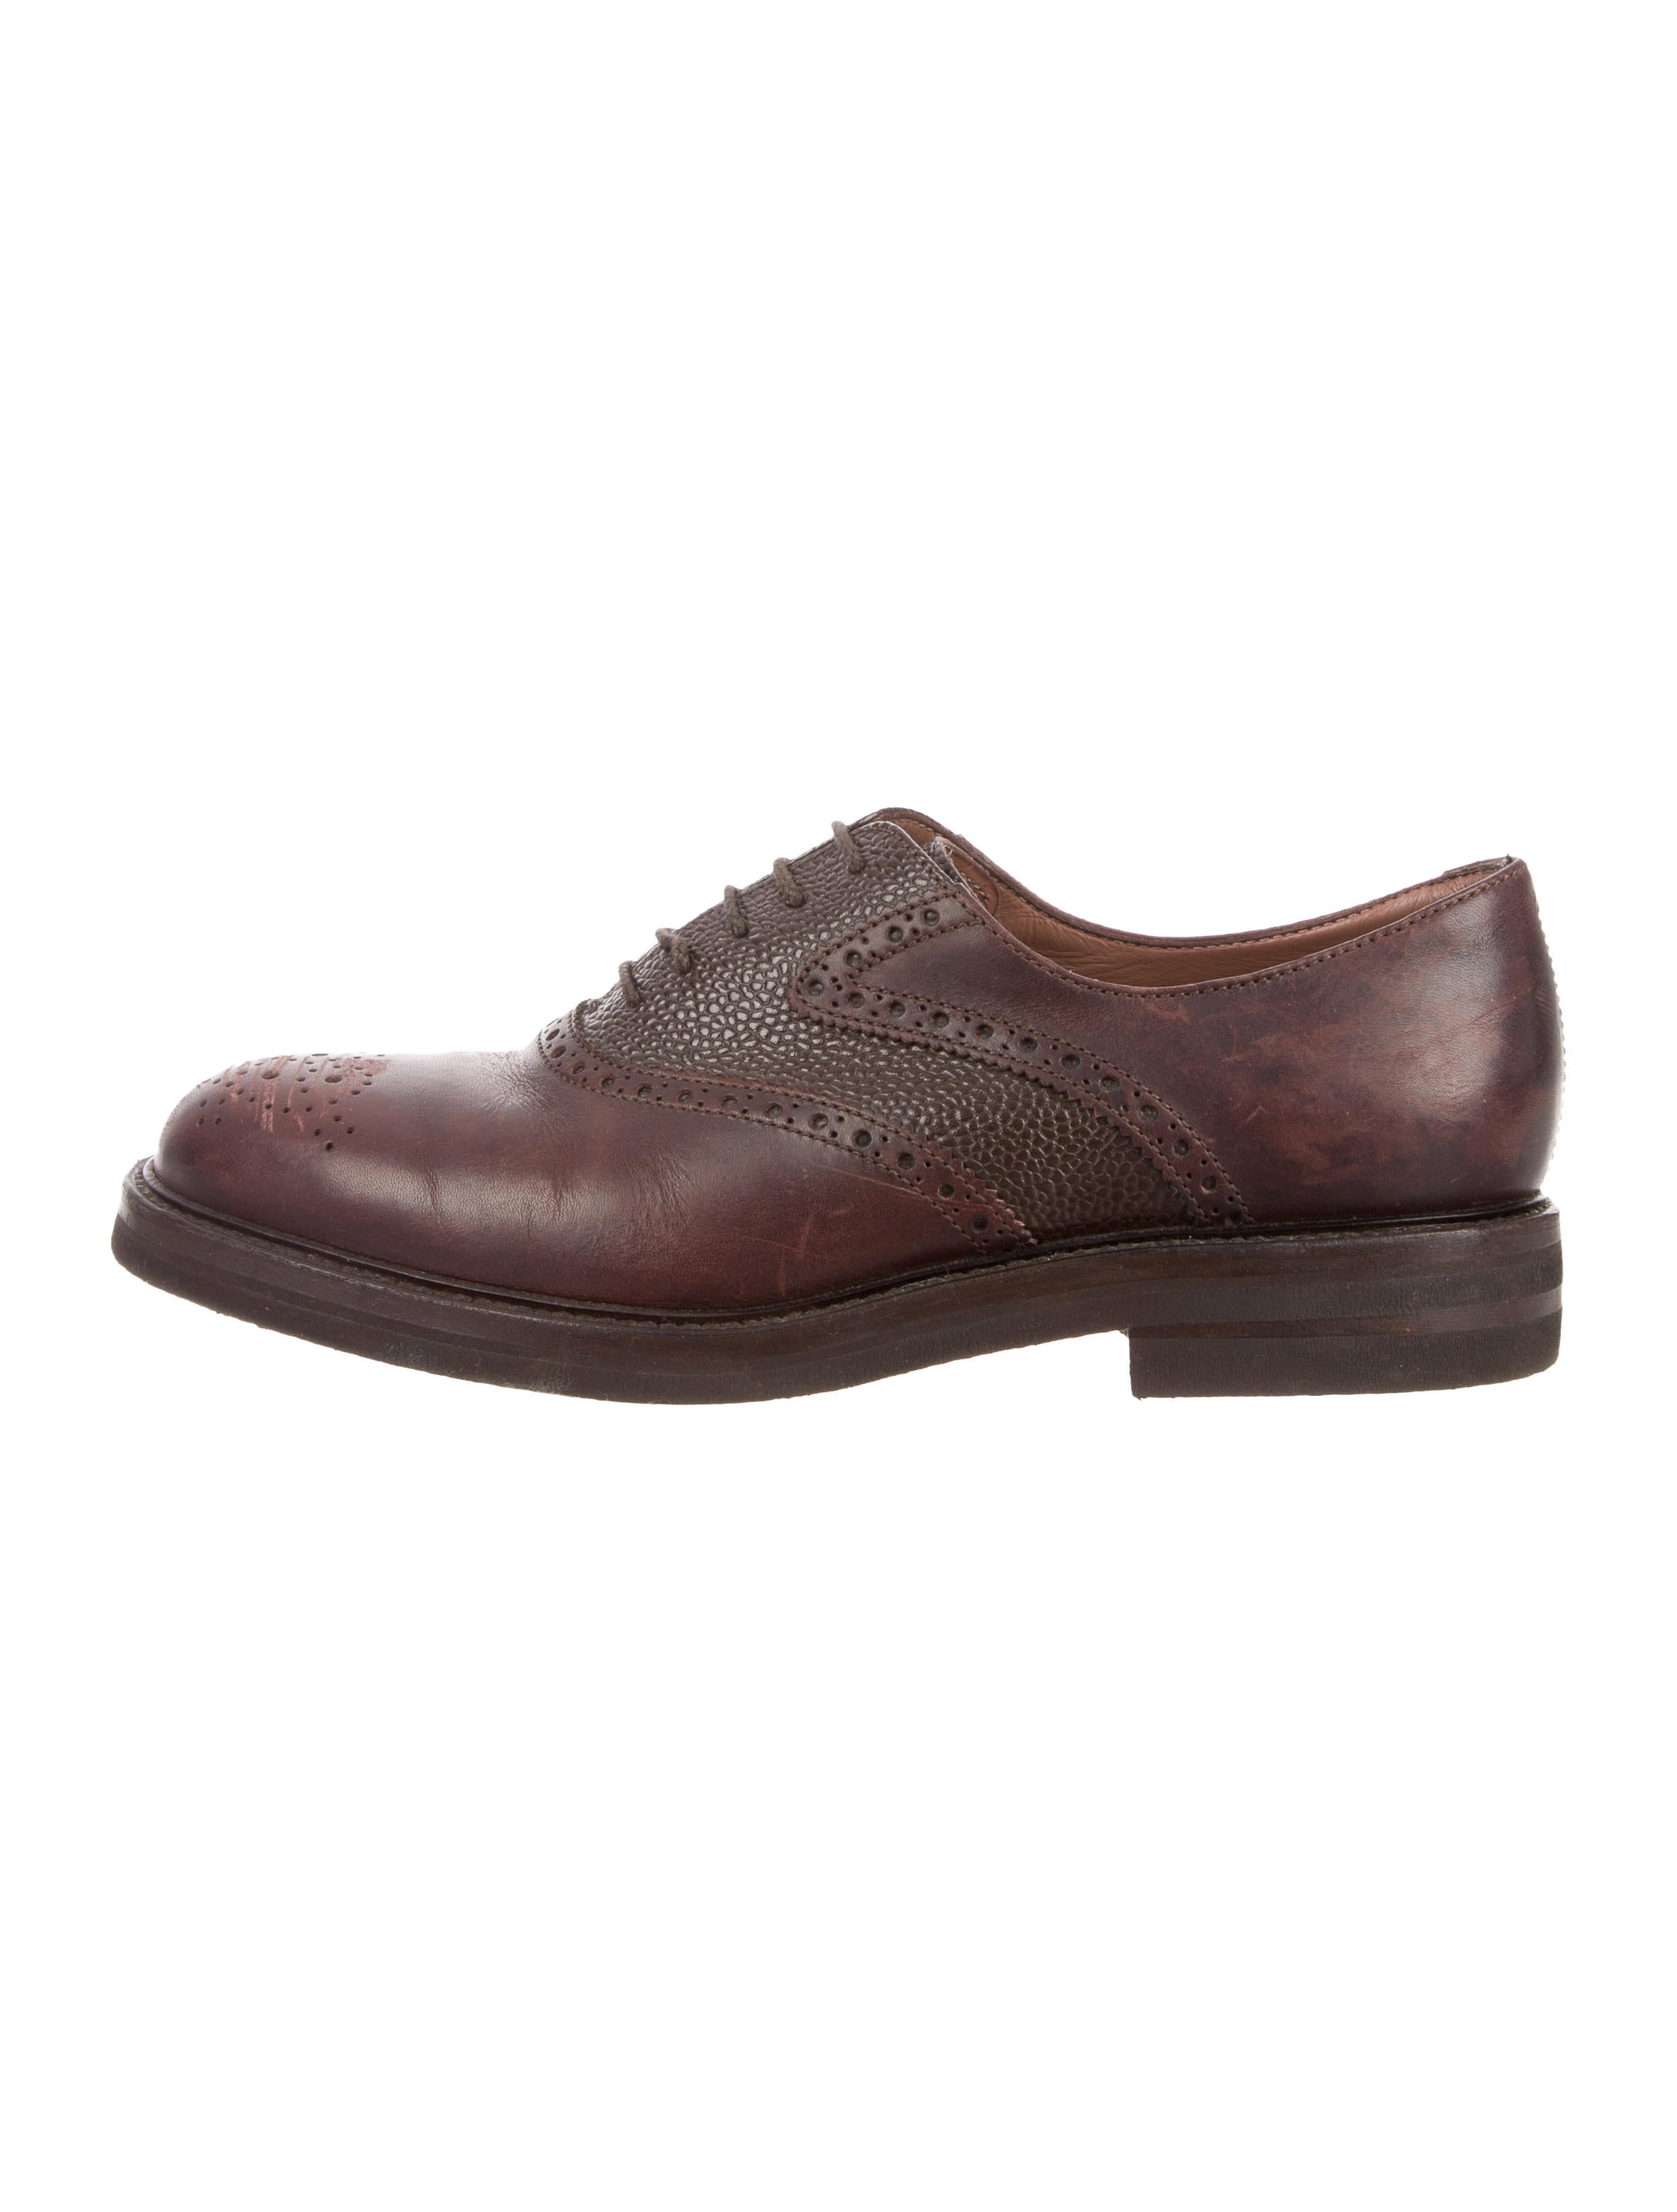 Brunello Cucinelli Leather Round-Toe Oxfords deals sale online IjgdO3MWnf